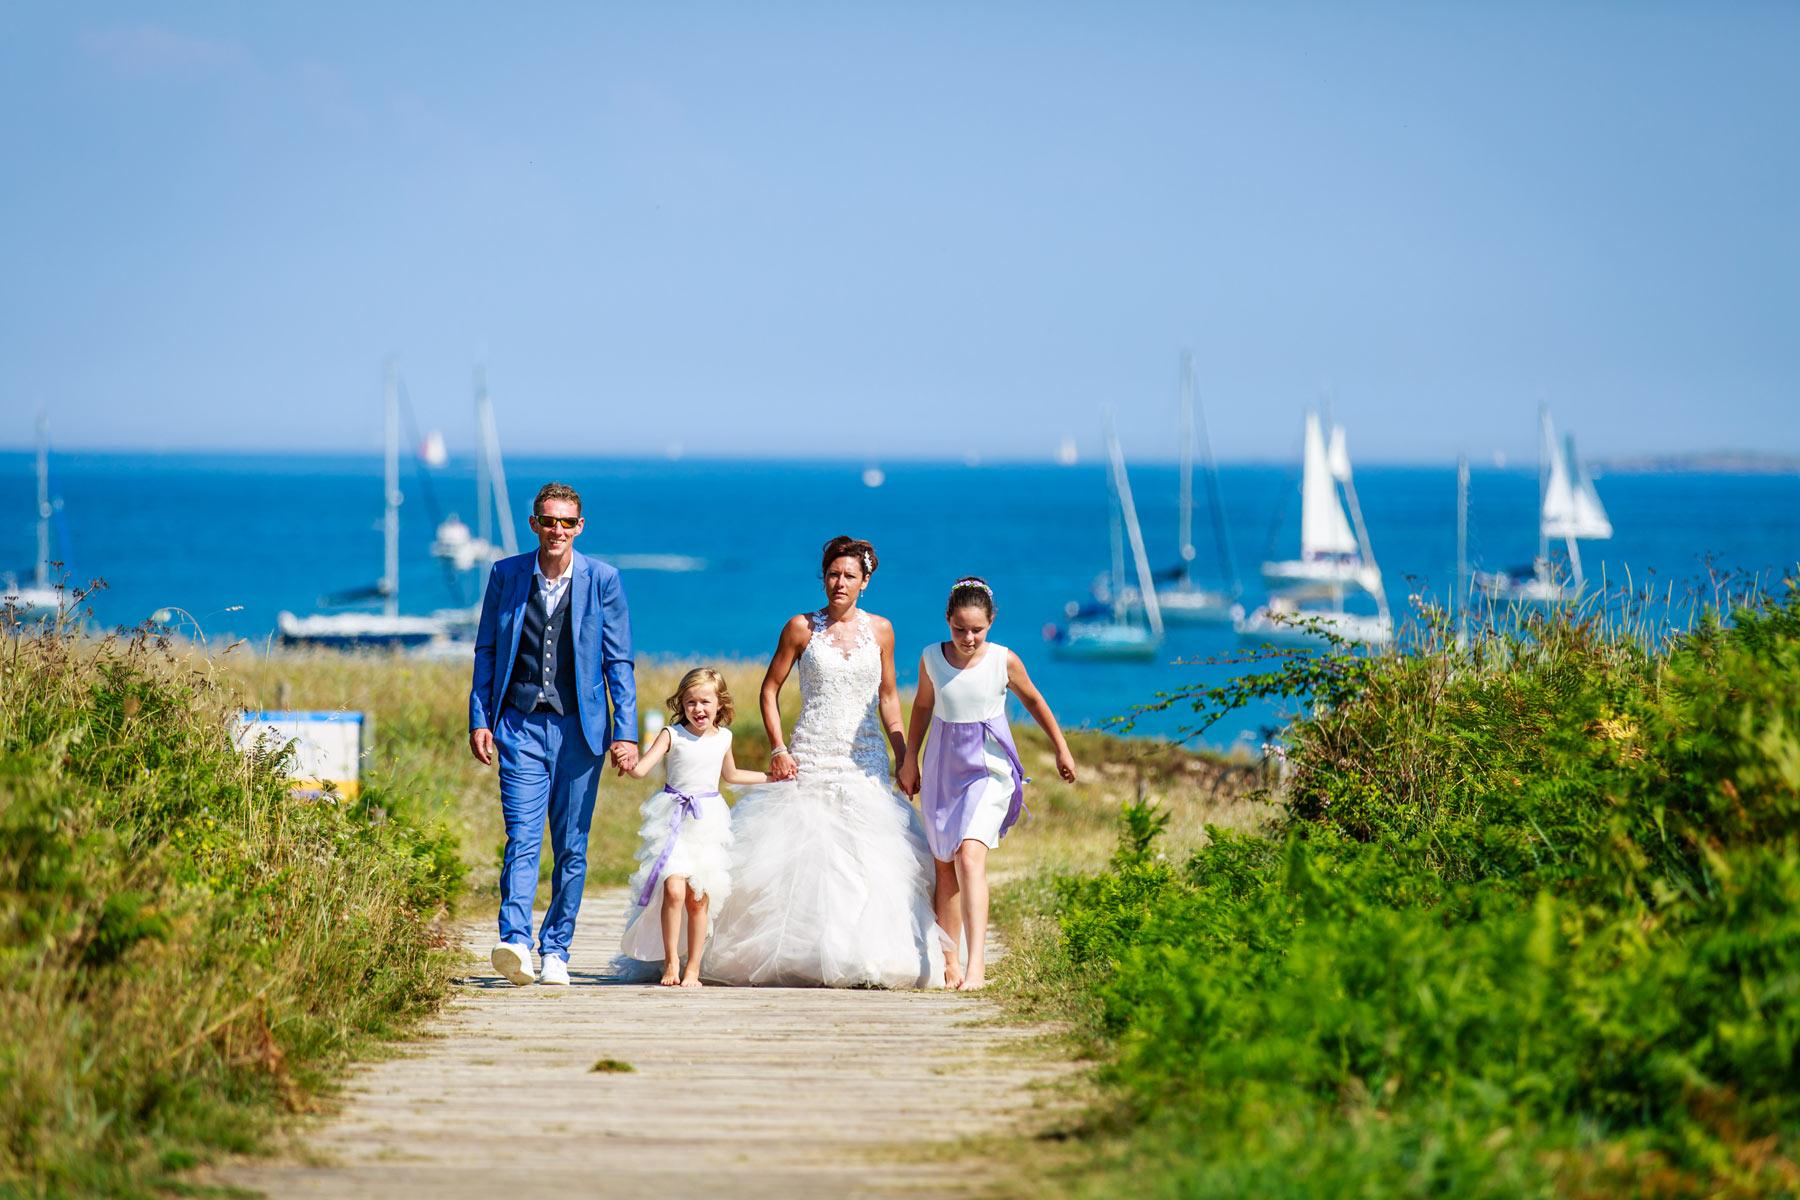 Reportage photo de mariage  Ile de Houat  , photographe mariage morbihan , photographe nils dessale